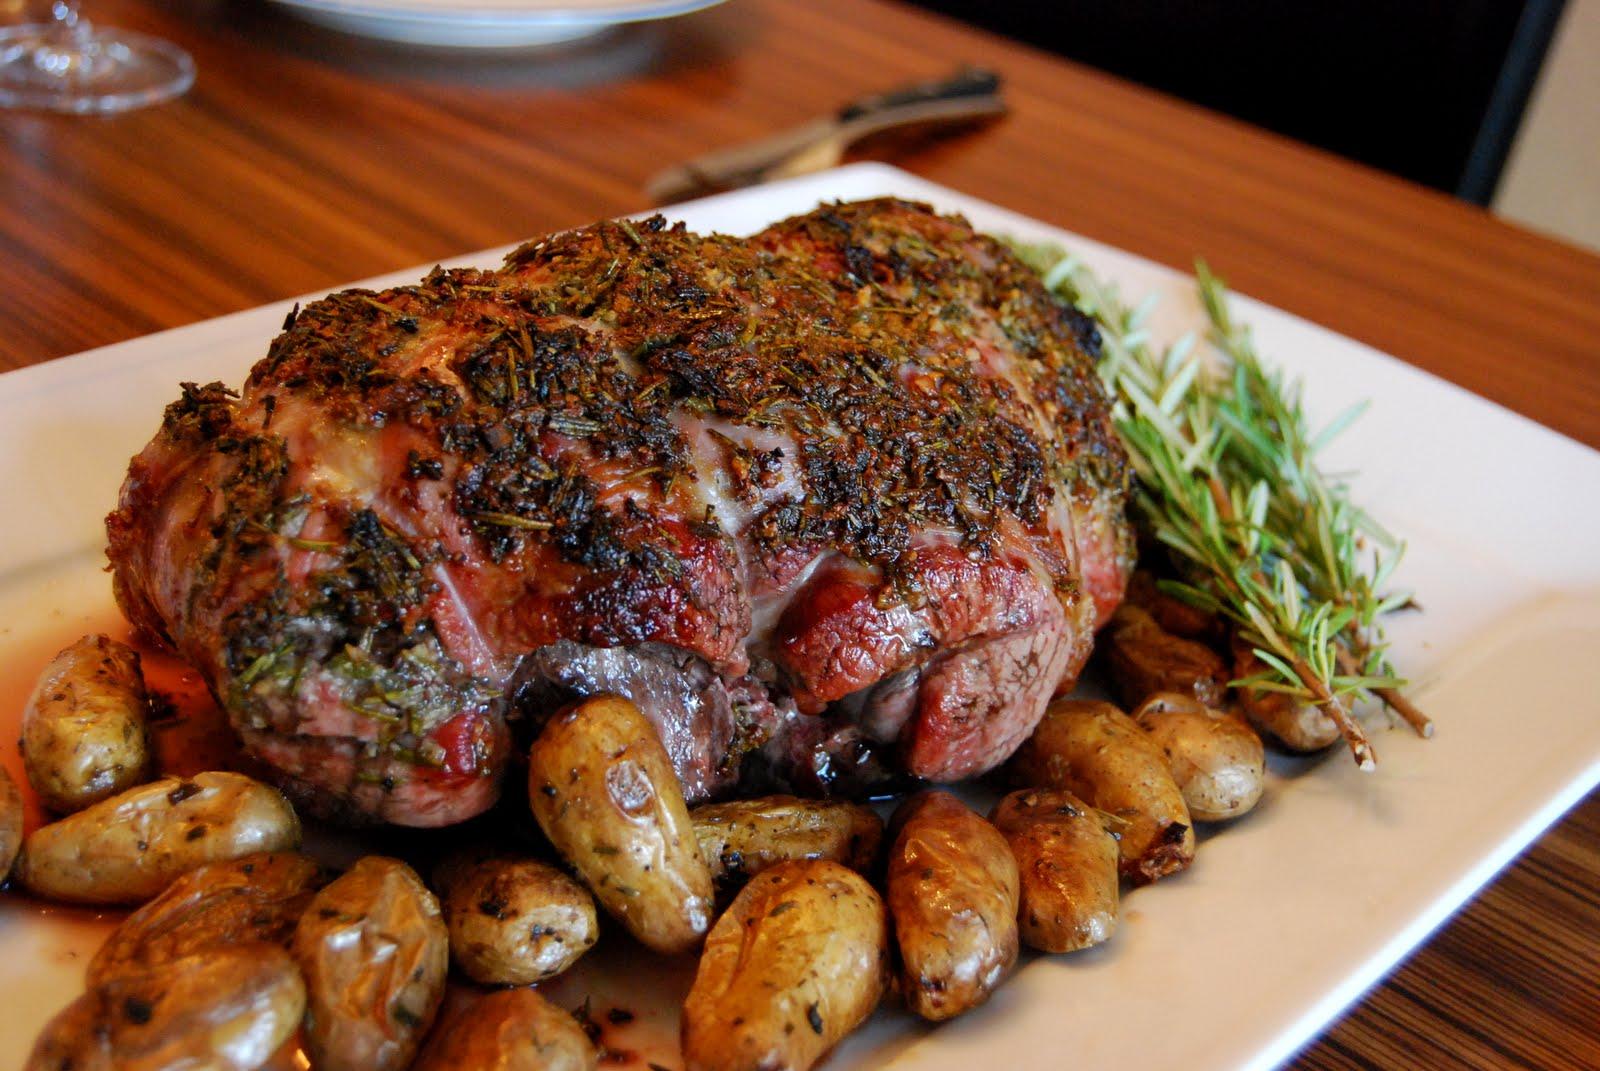 Rosemary and Garlic Roasted Leg of Lamb with Potatoes